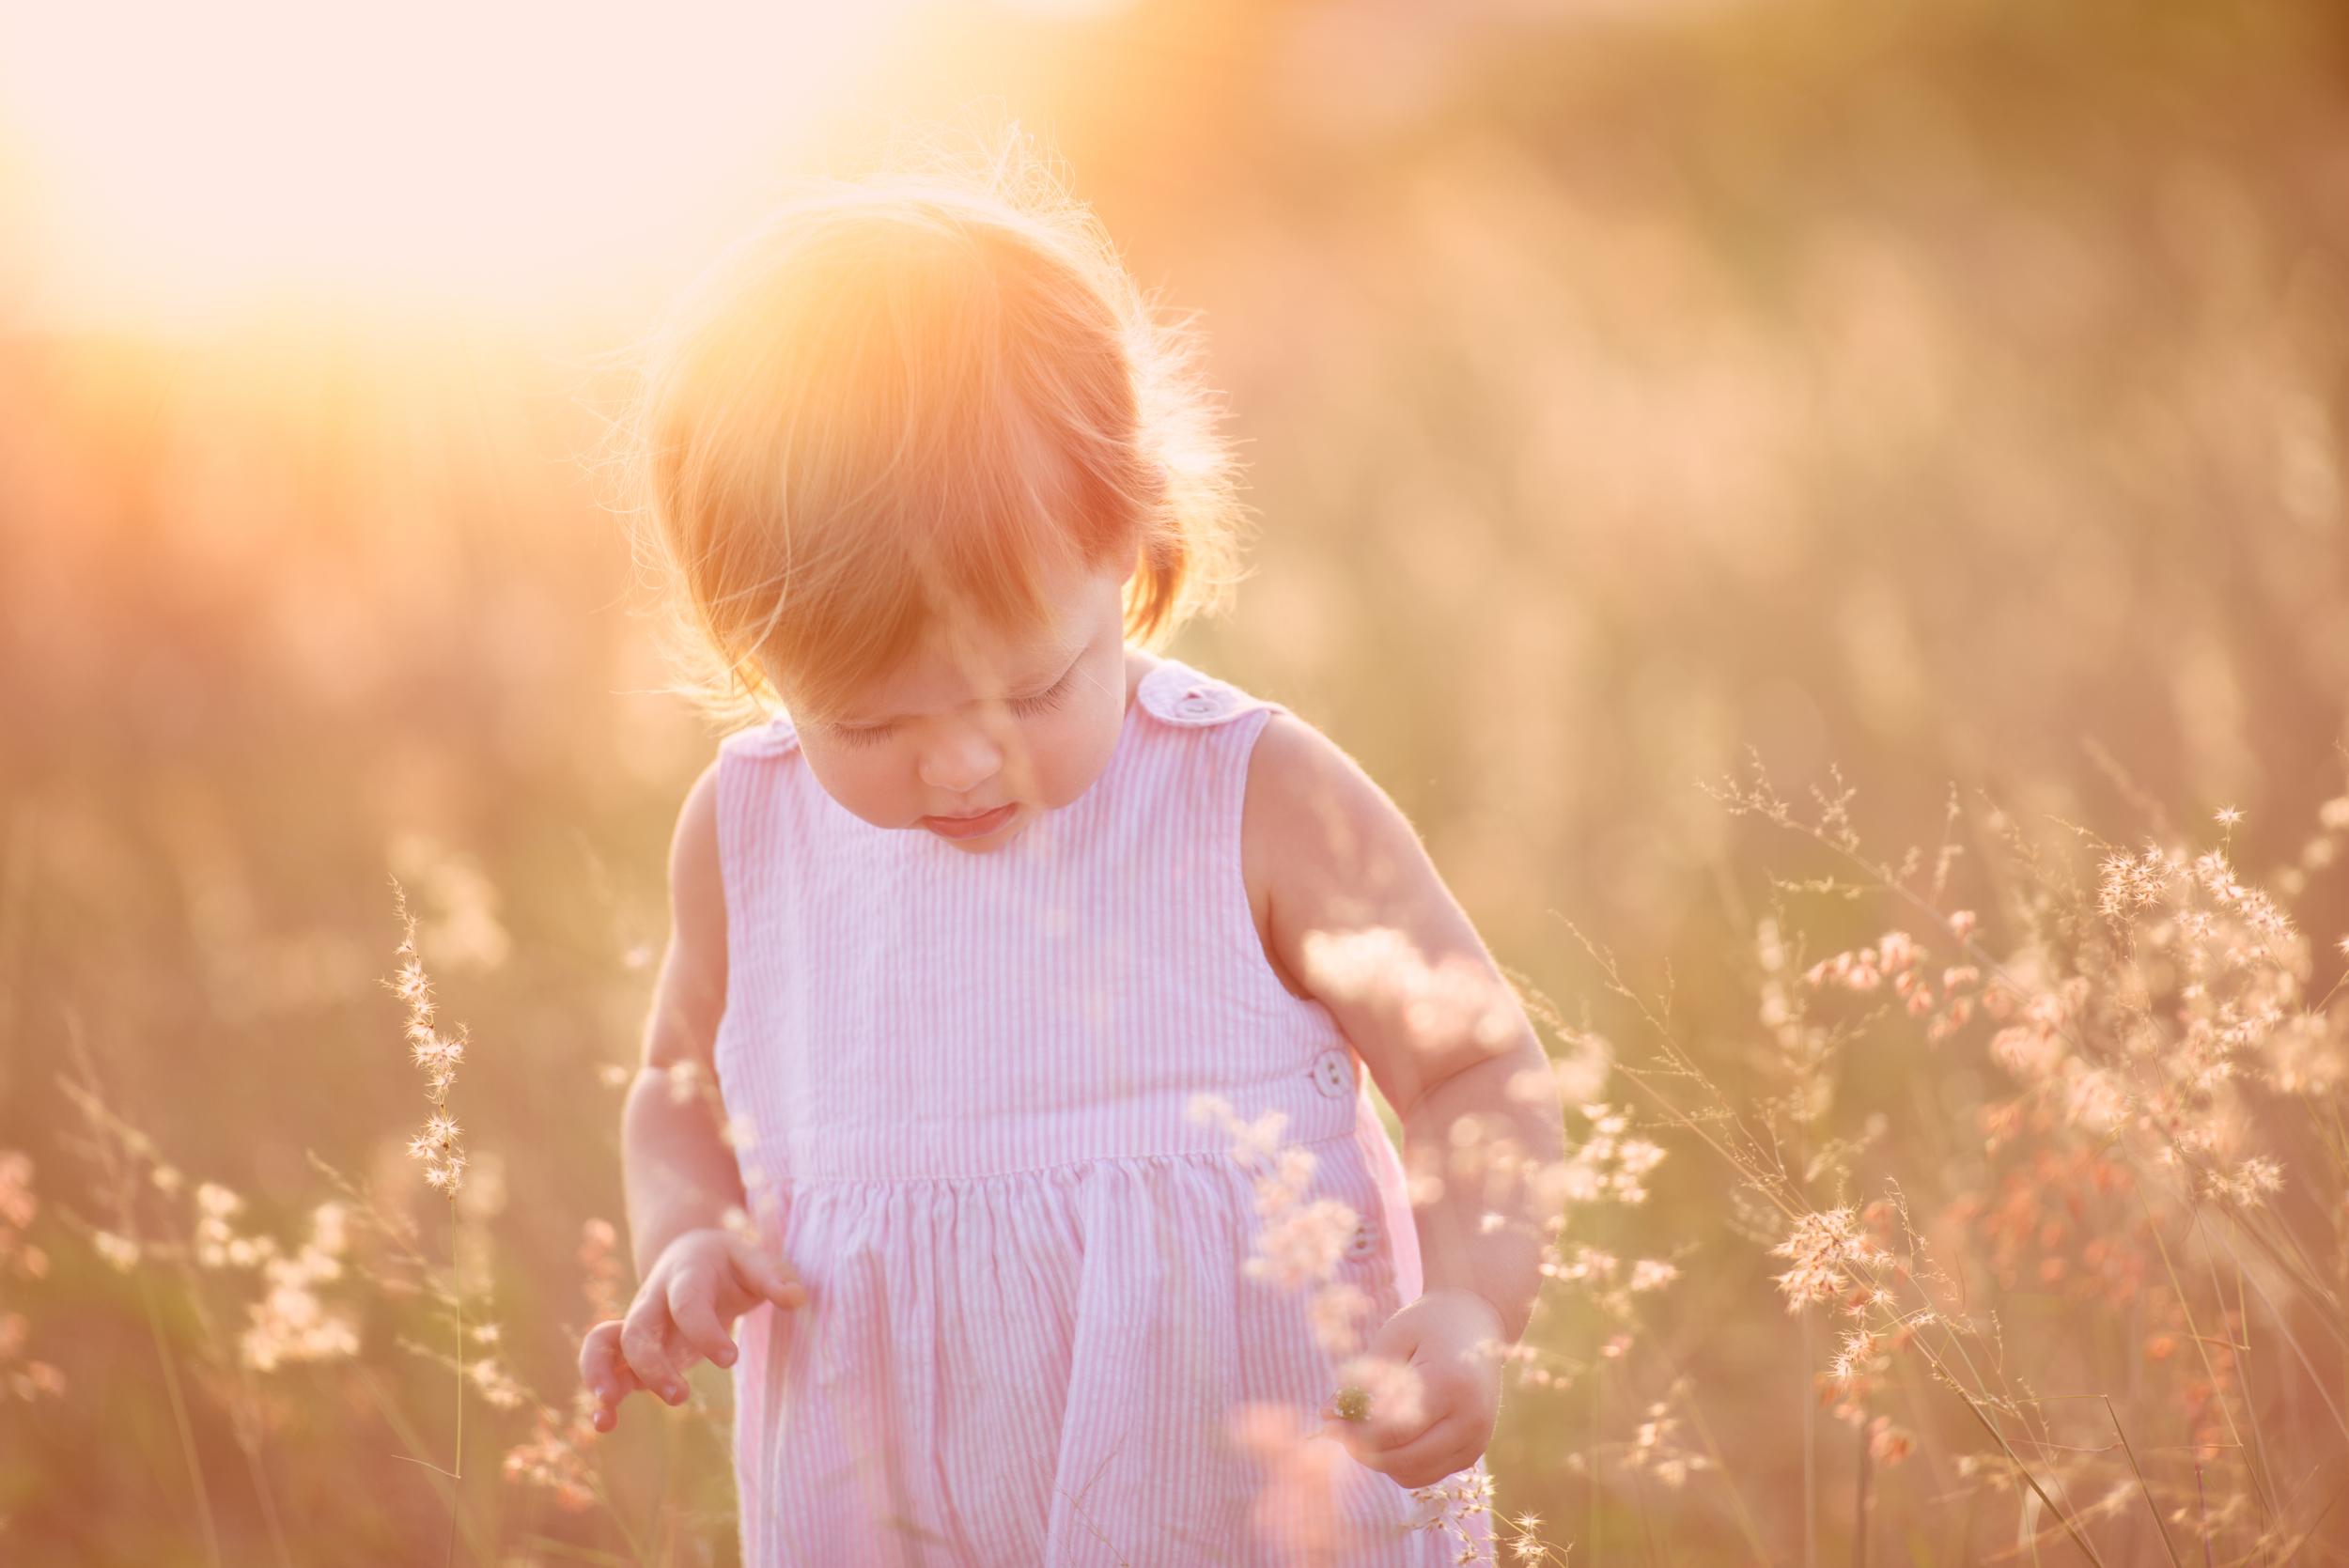 London child photography | dreamy sunset shoot